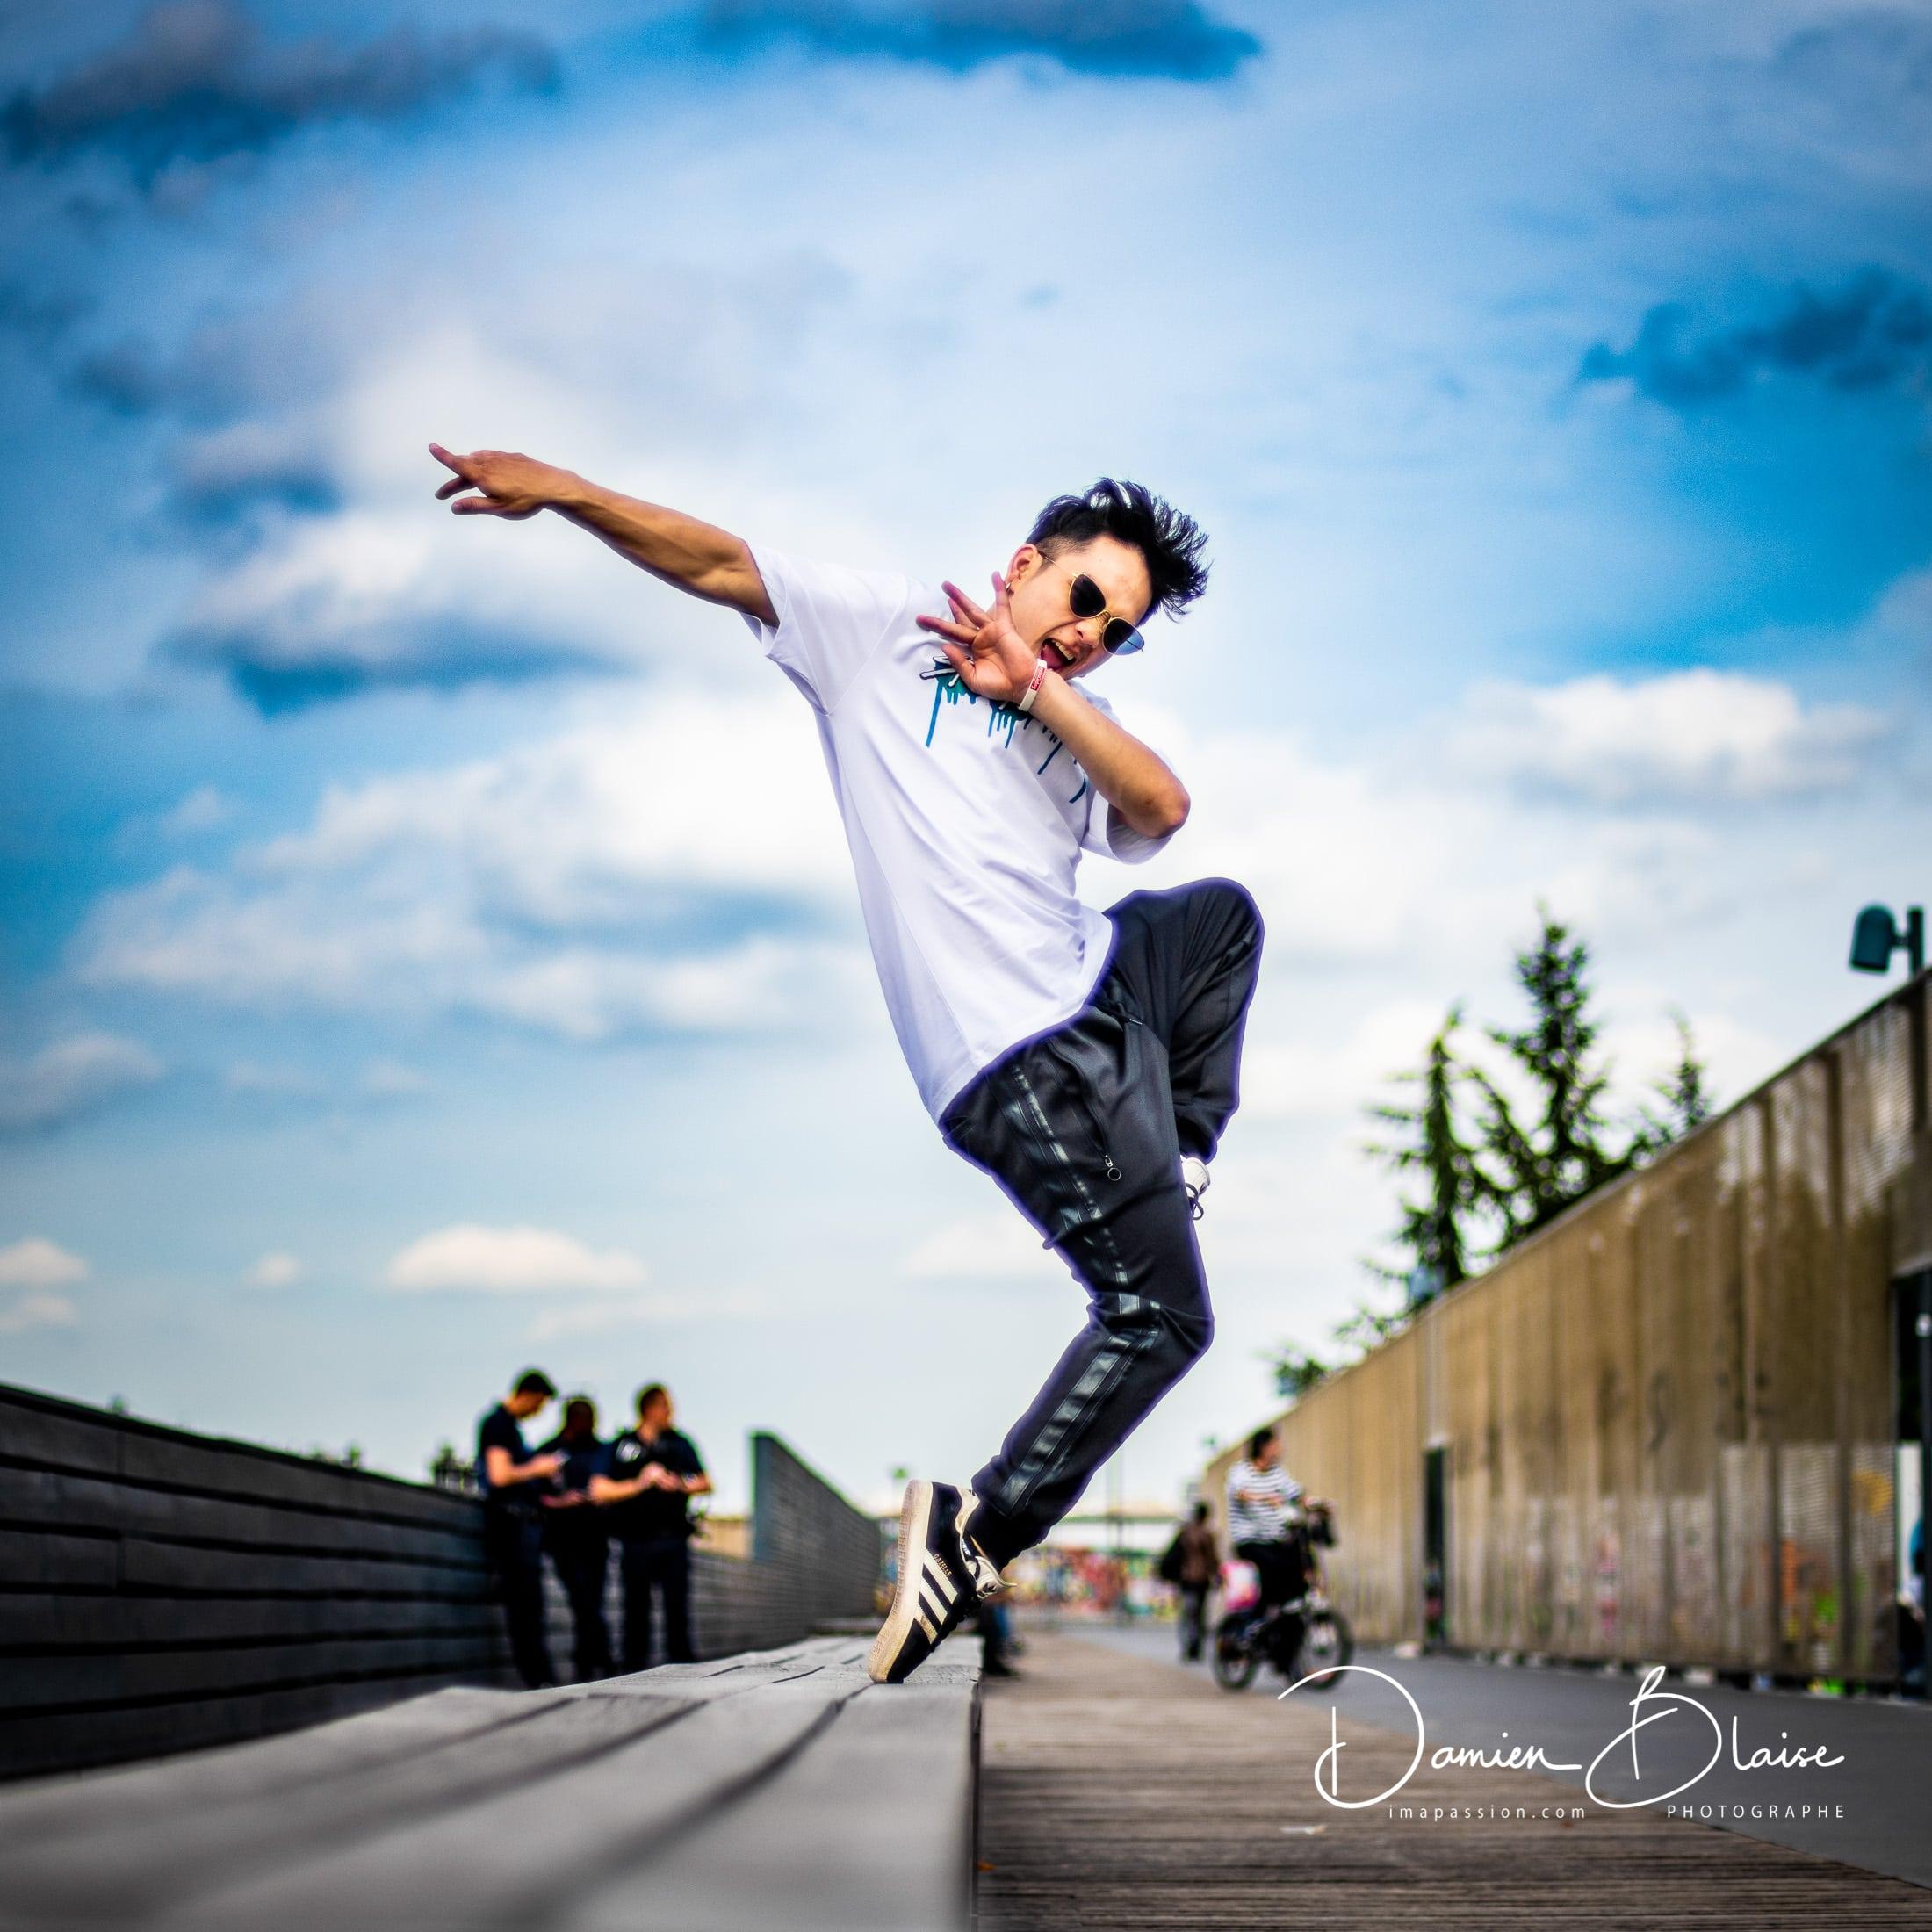 Damien BLAISE Photographe Imapassion